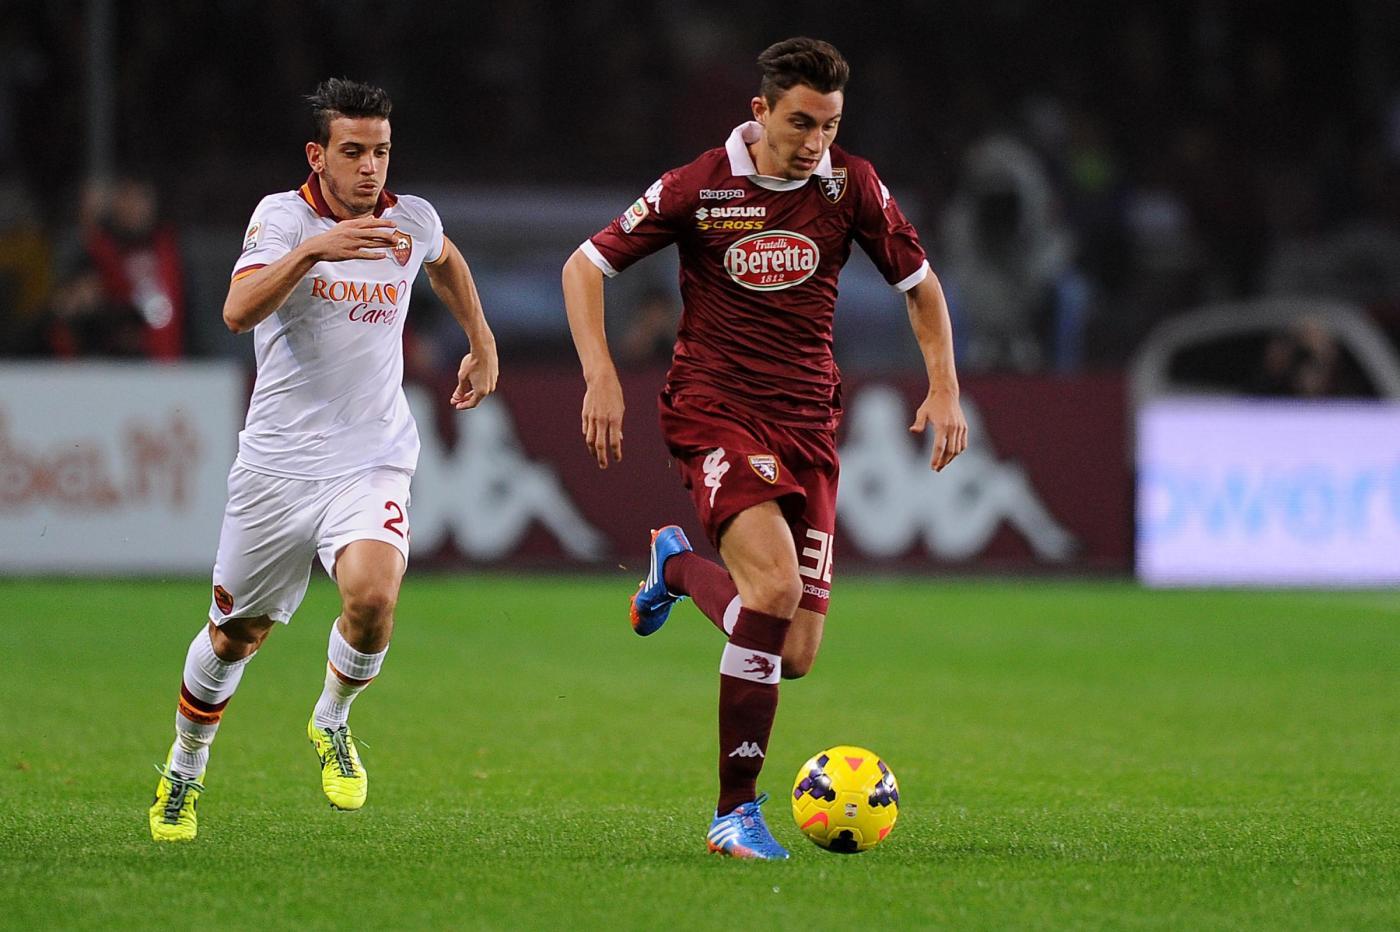 Calciomercato estero: Barcellona su Darmian